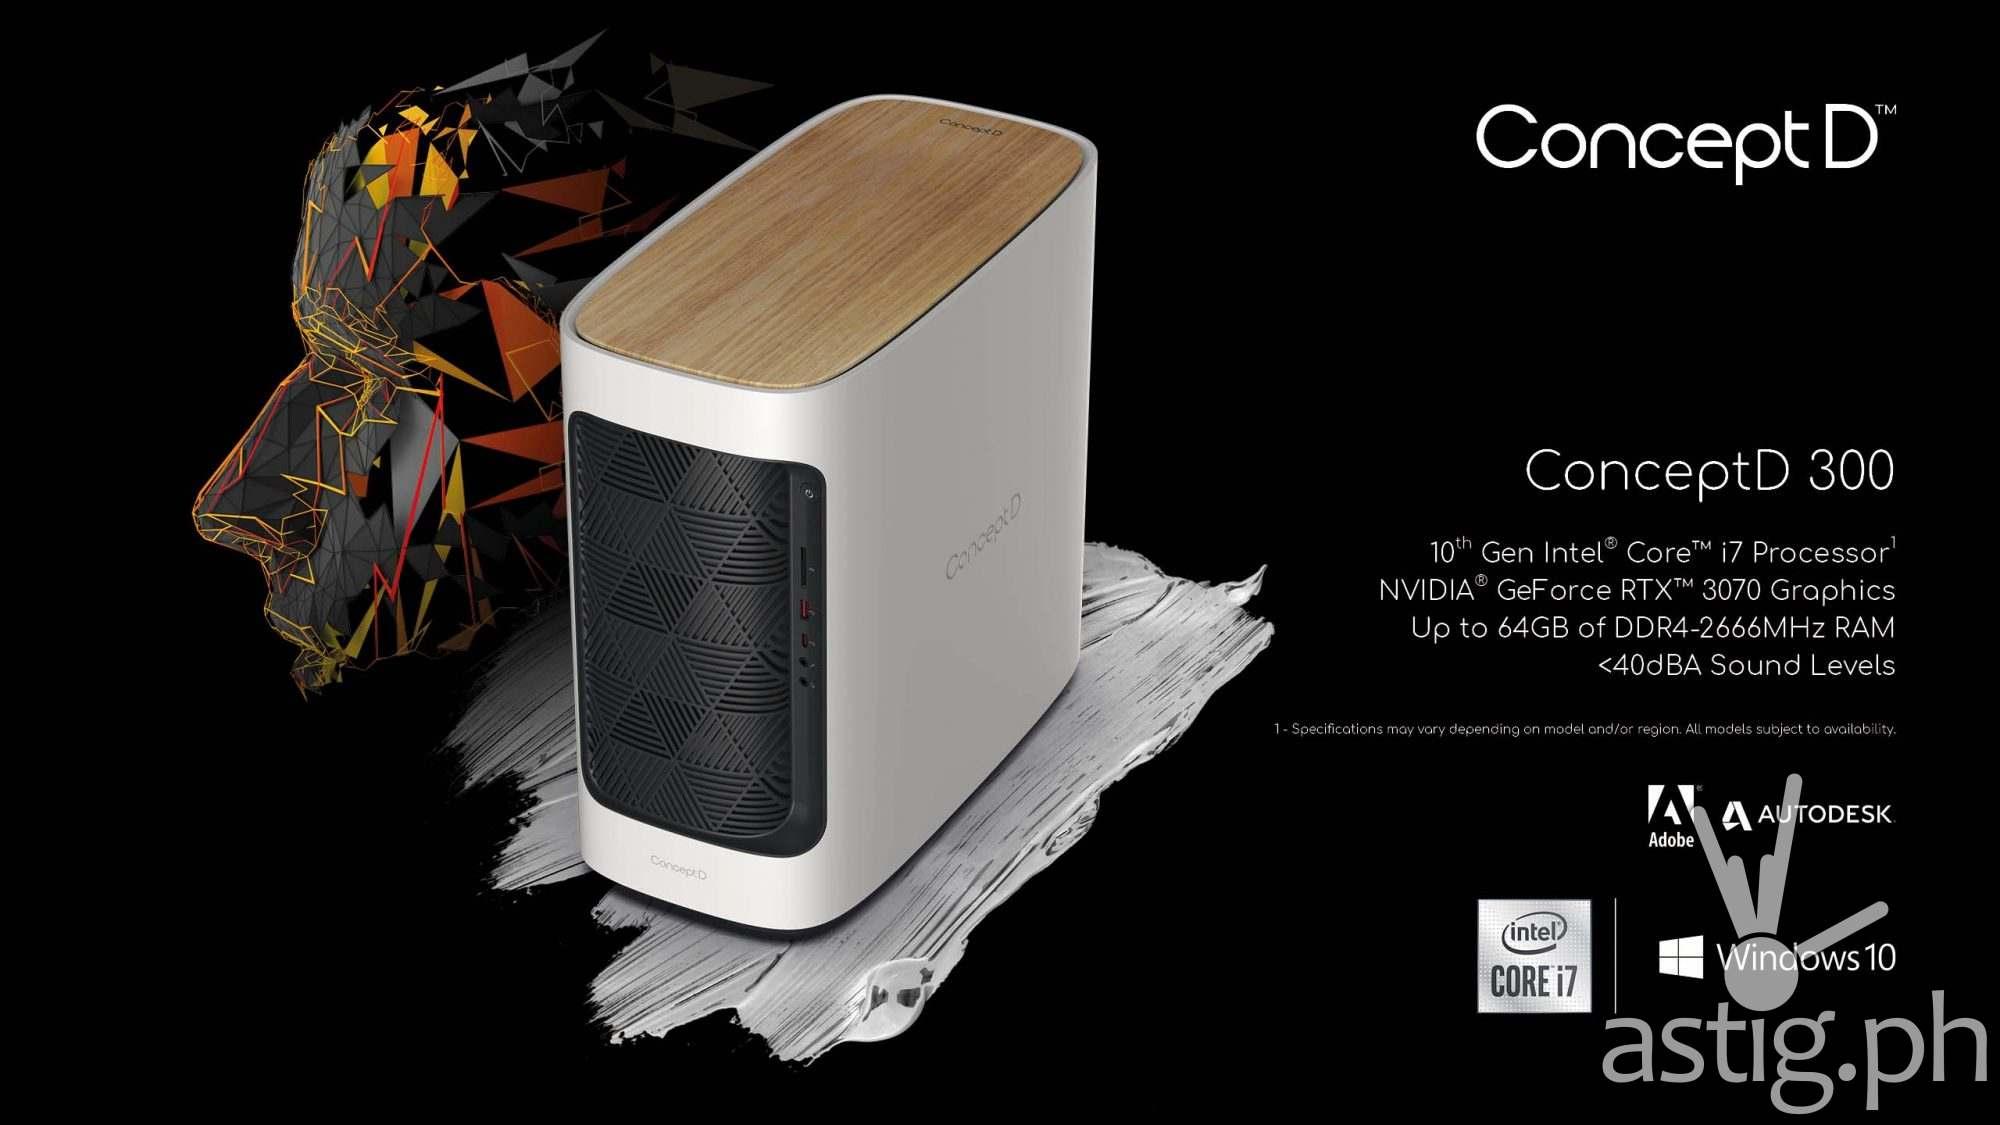 Acer ConceptD 300